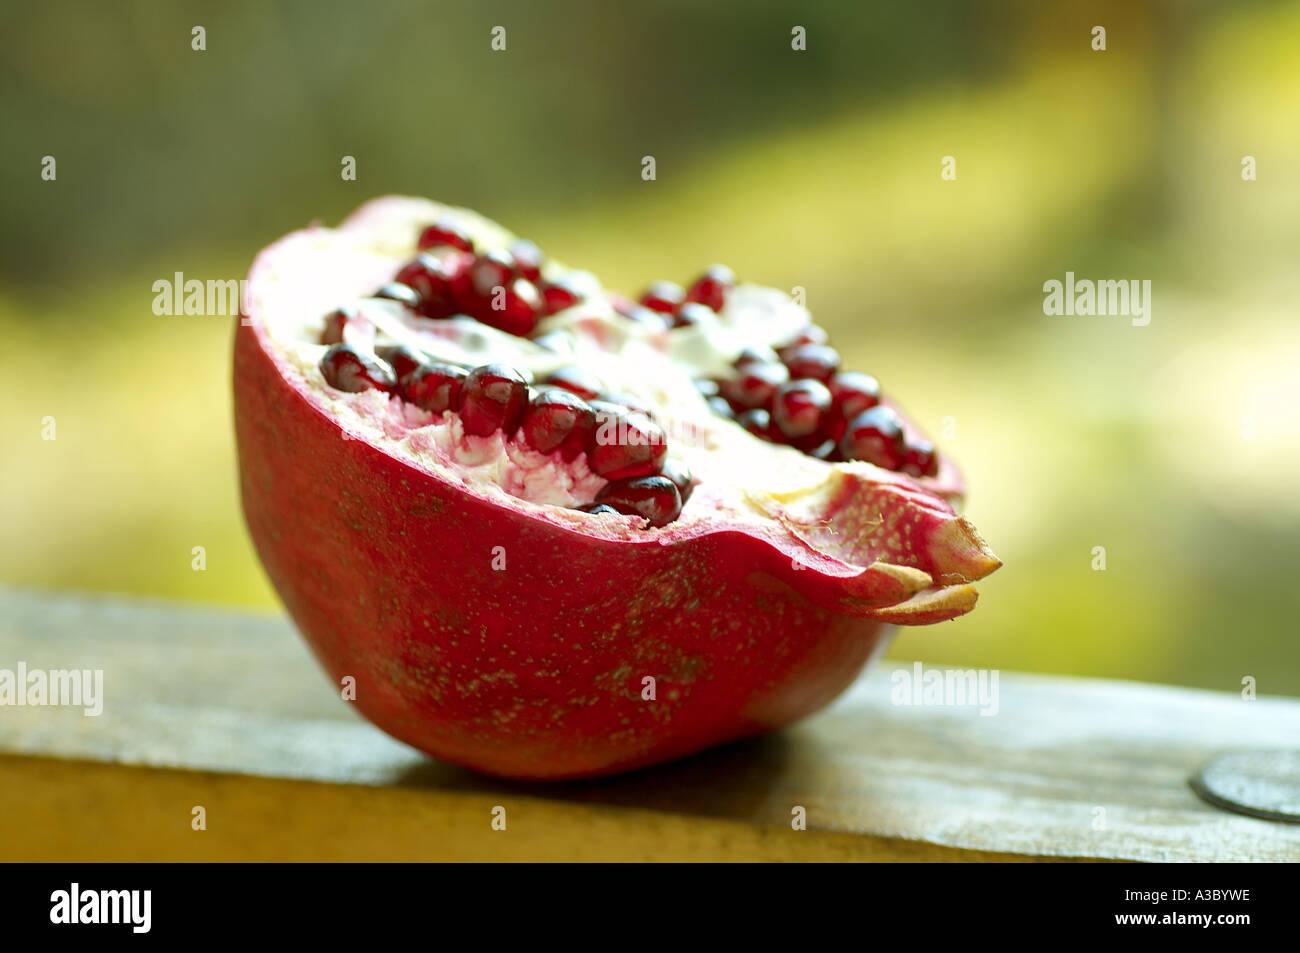 a half of pomegrante - Stock Image